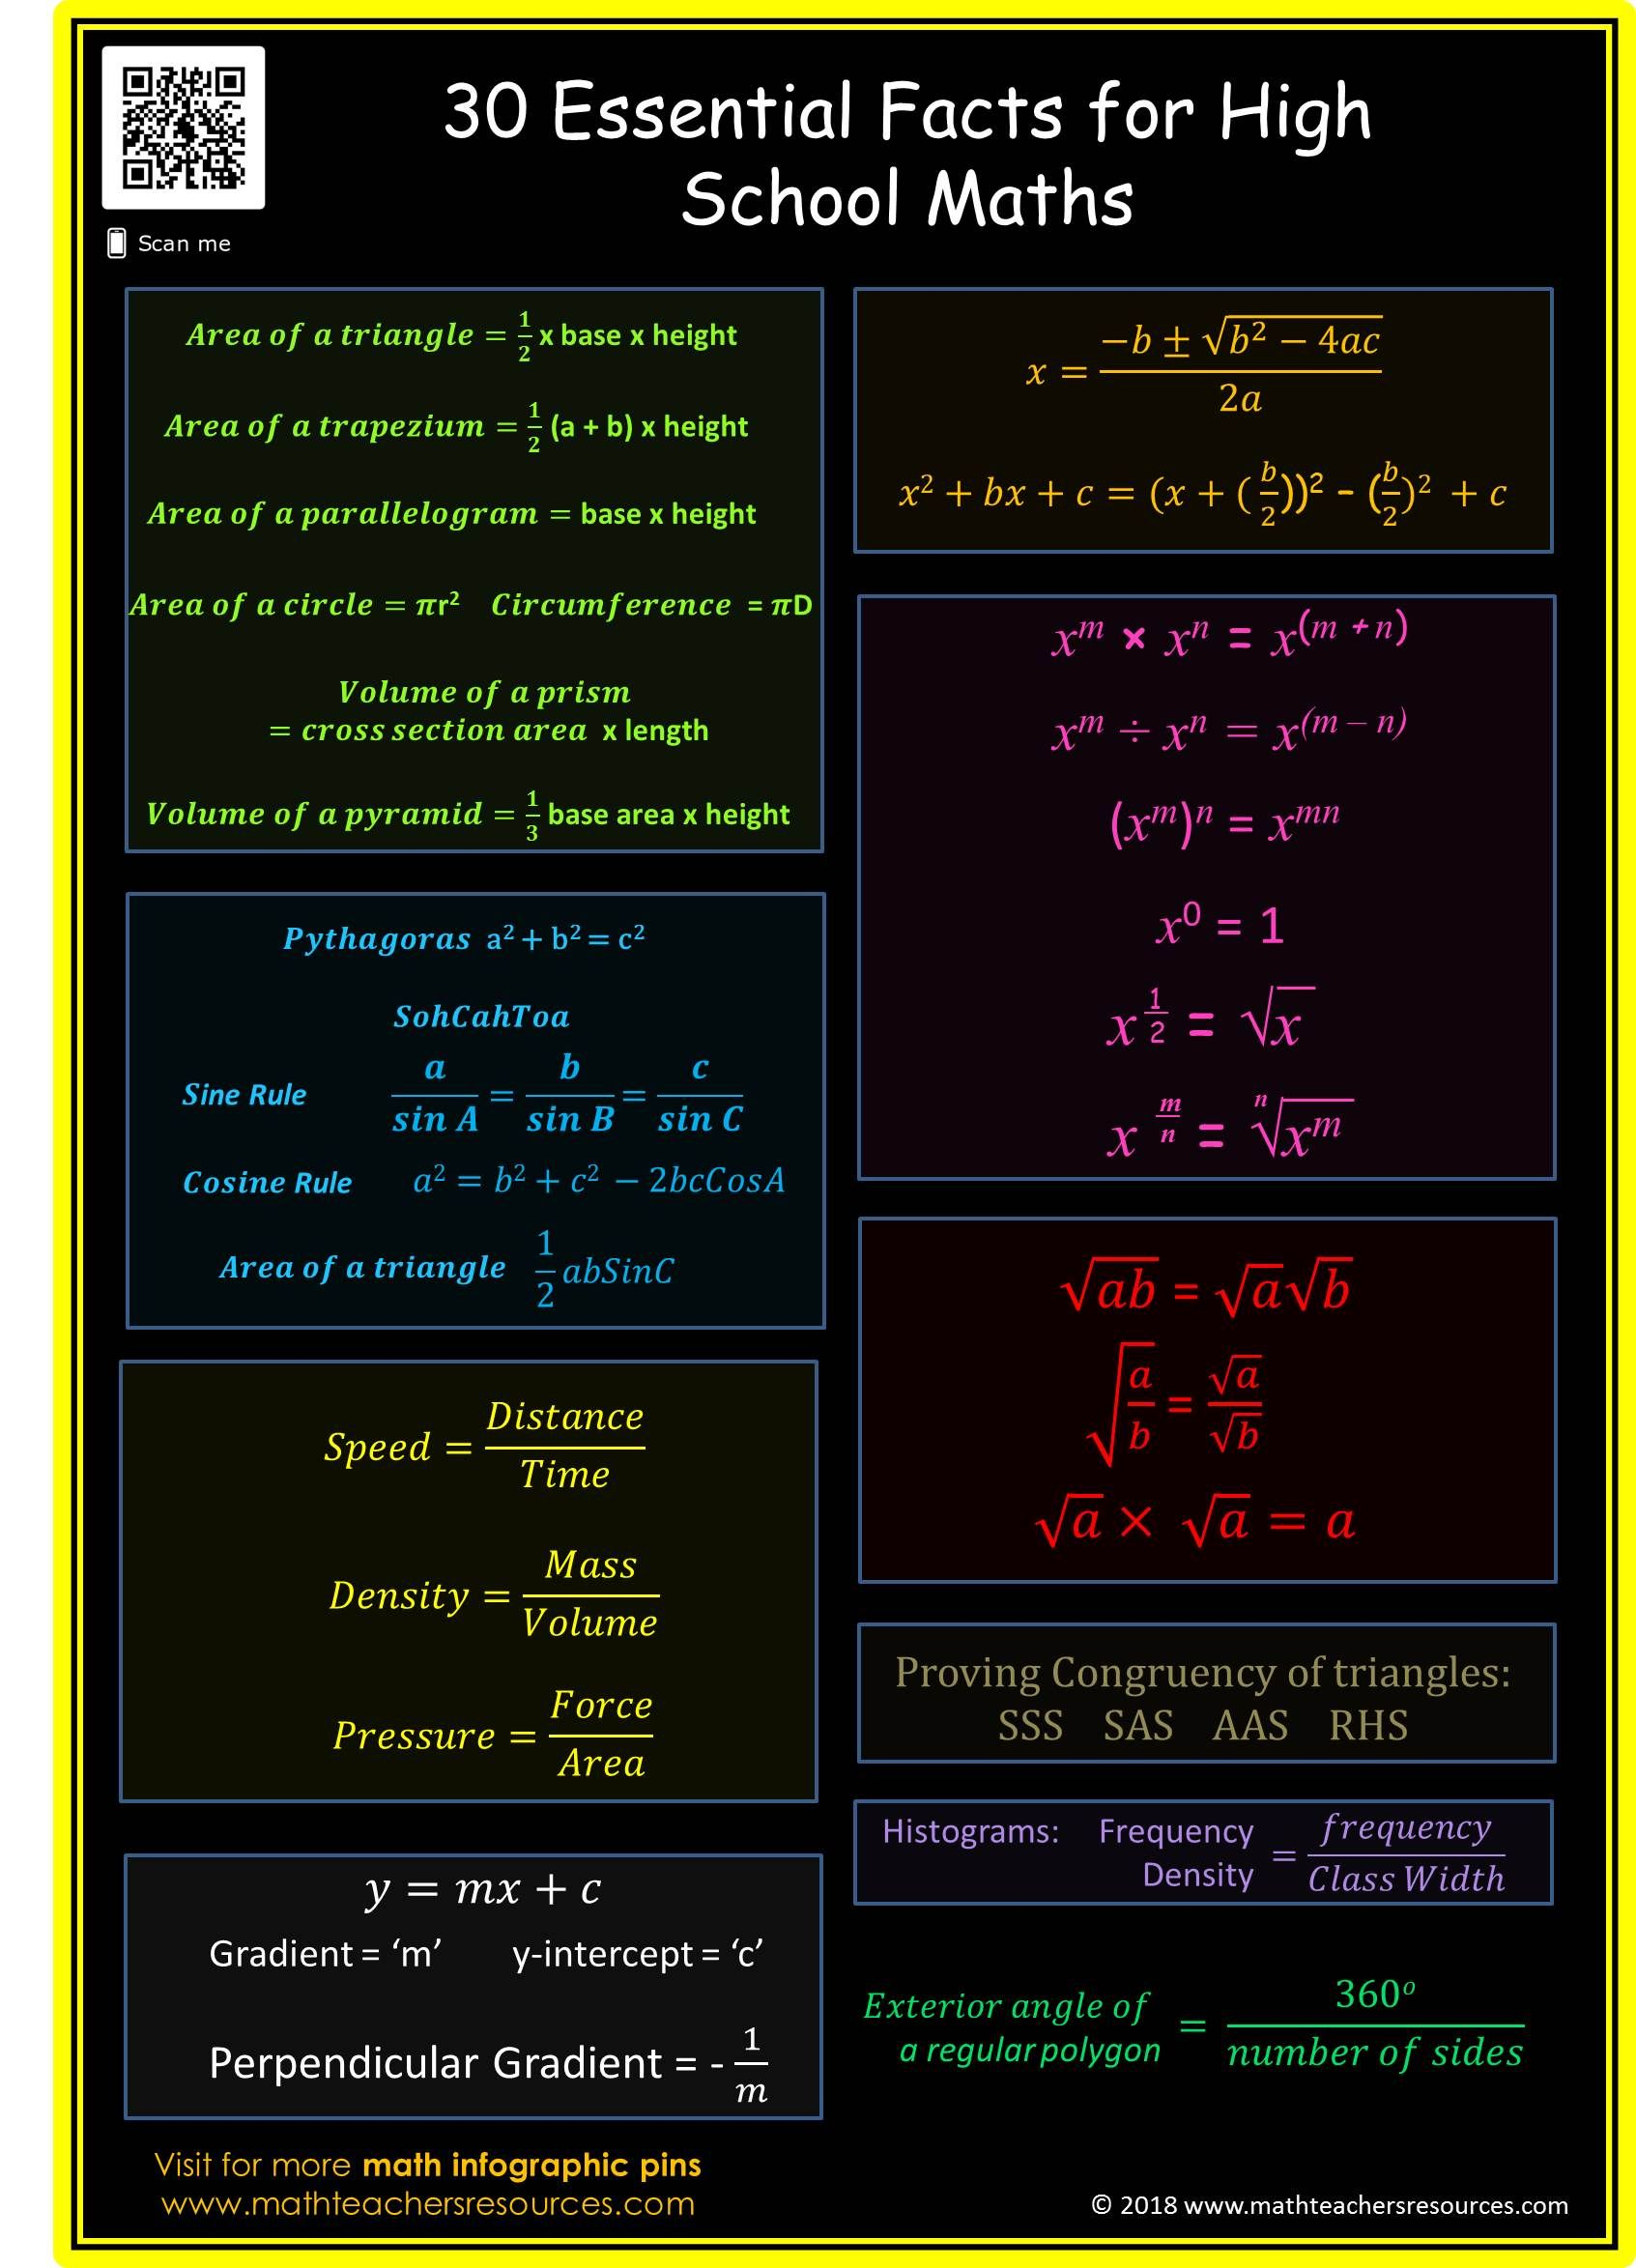 Math Infographic 30 Essential Formulas For High School Math Teaching Resource Math Methods Math Infographic High School Math [ 2347 x 1693 Pixel ]